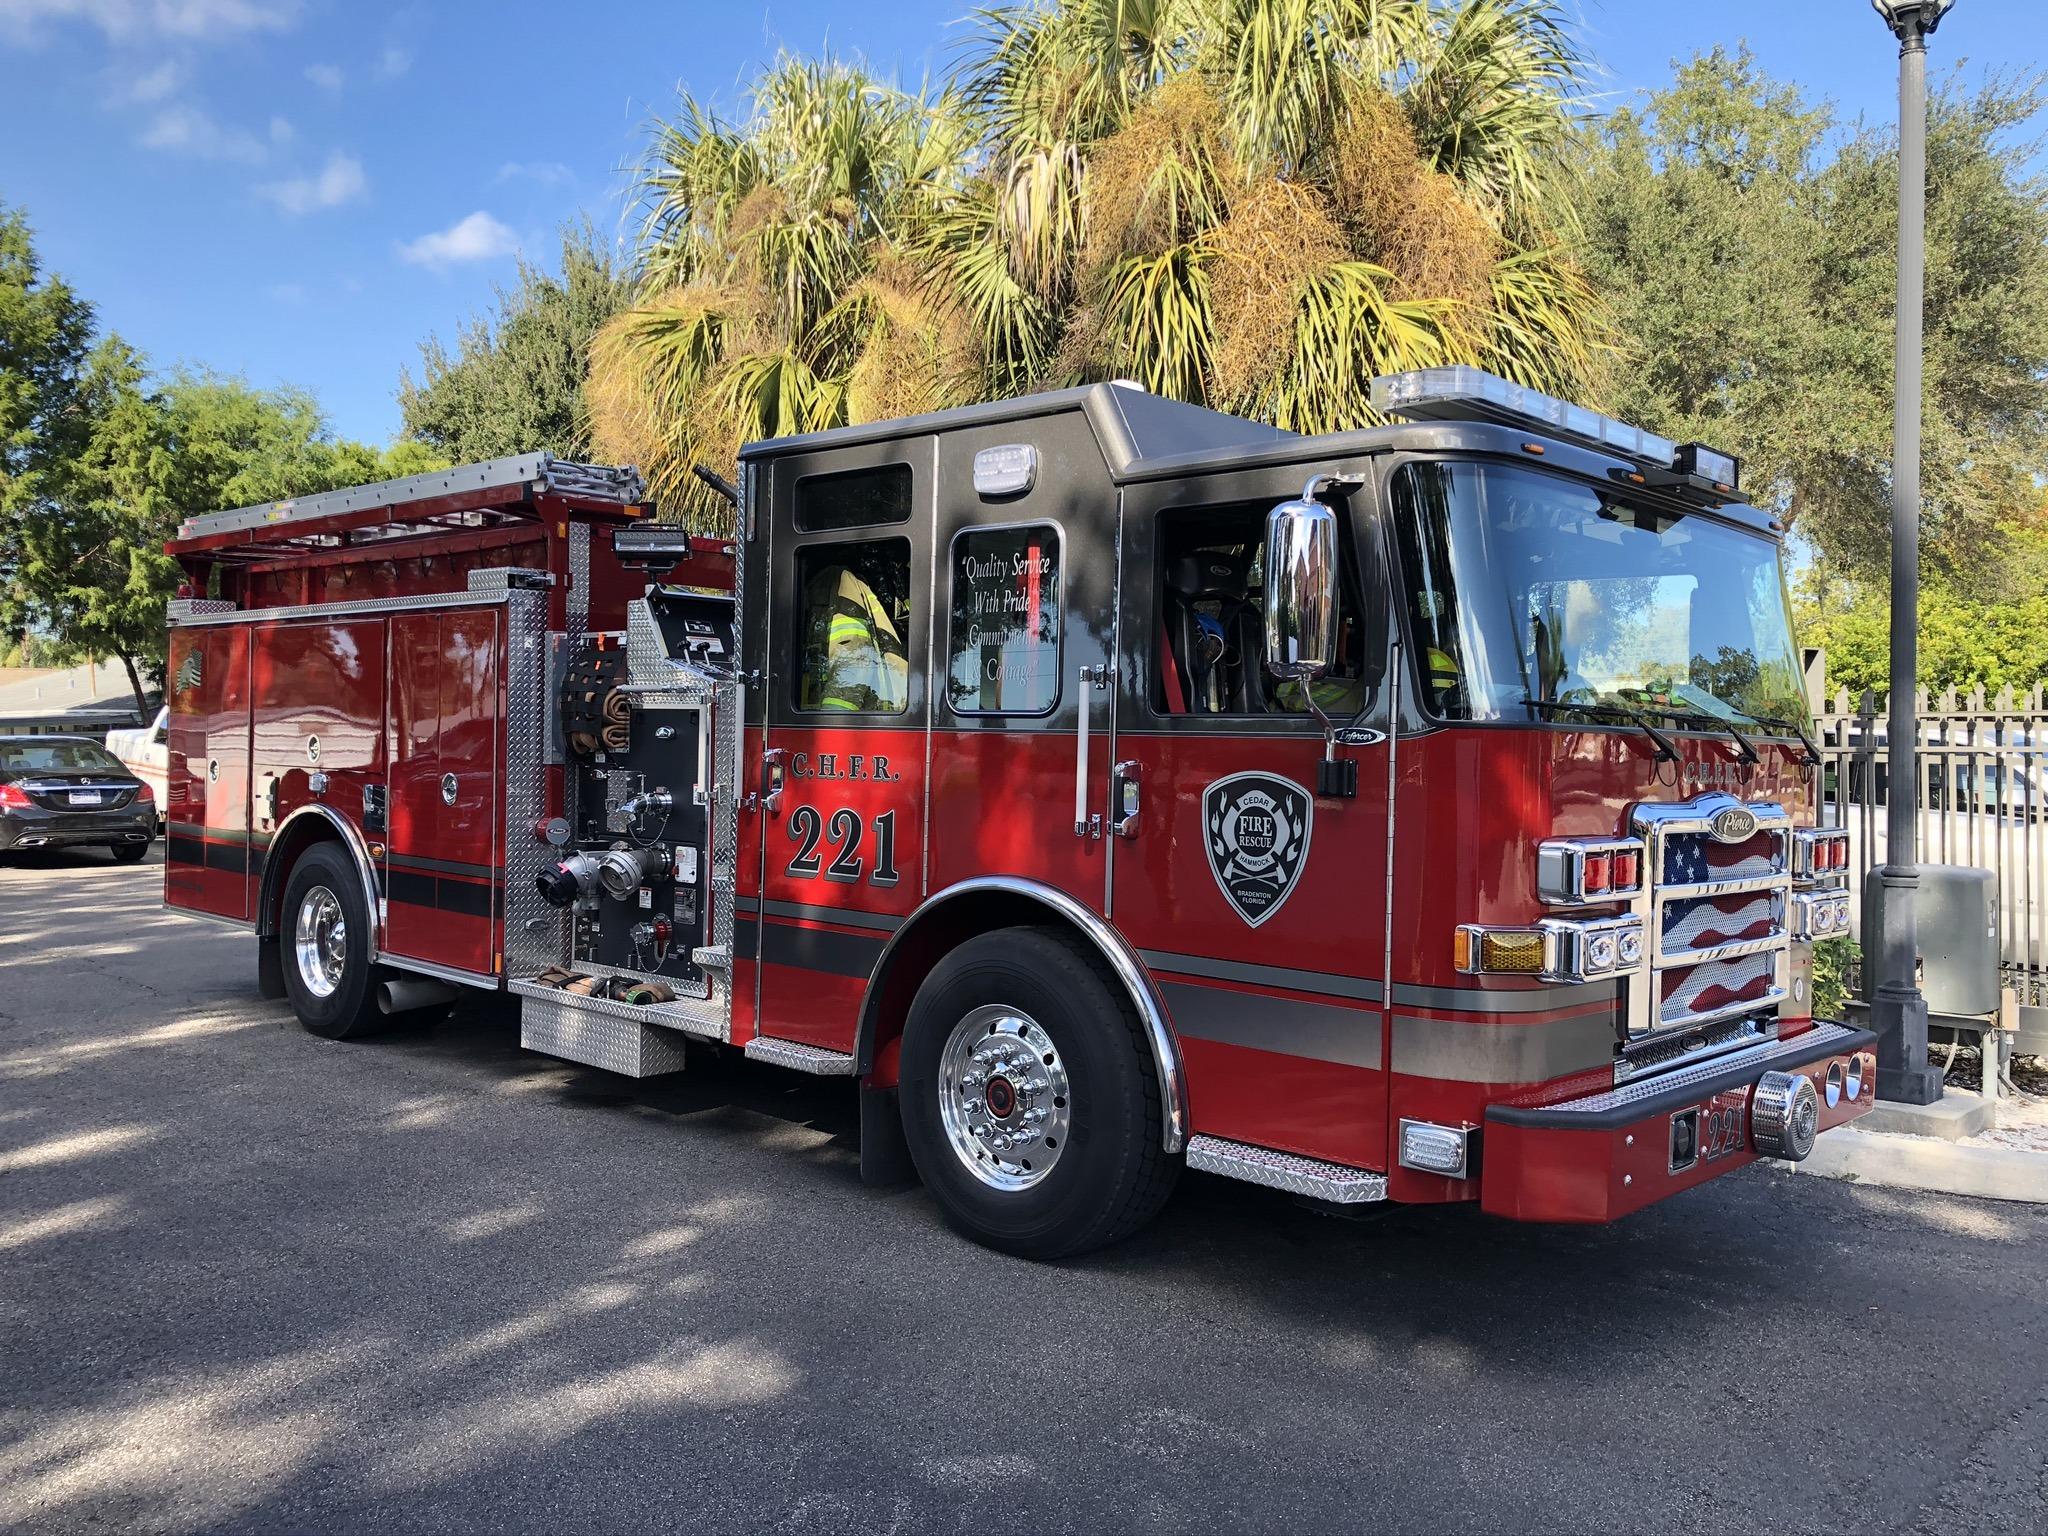 CHFR Engine 221